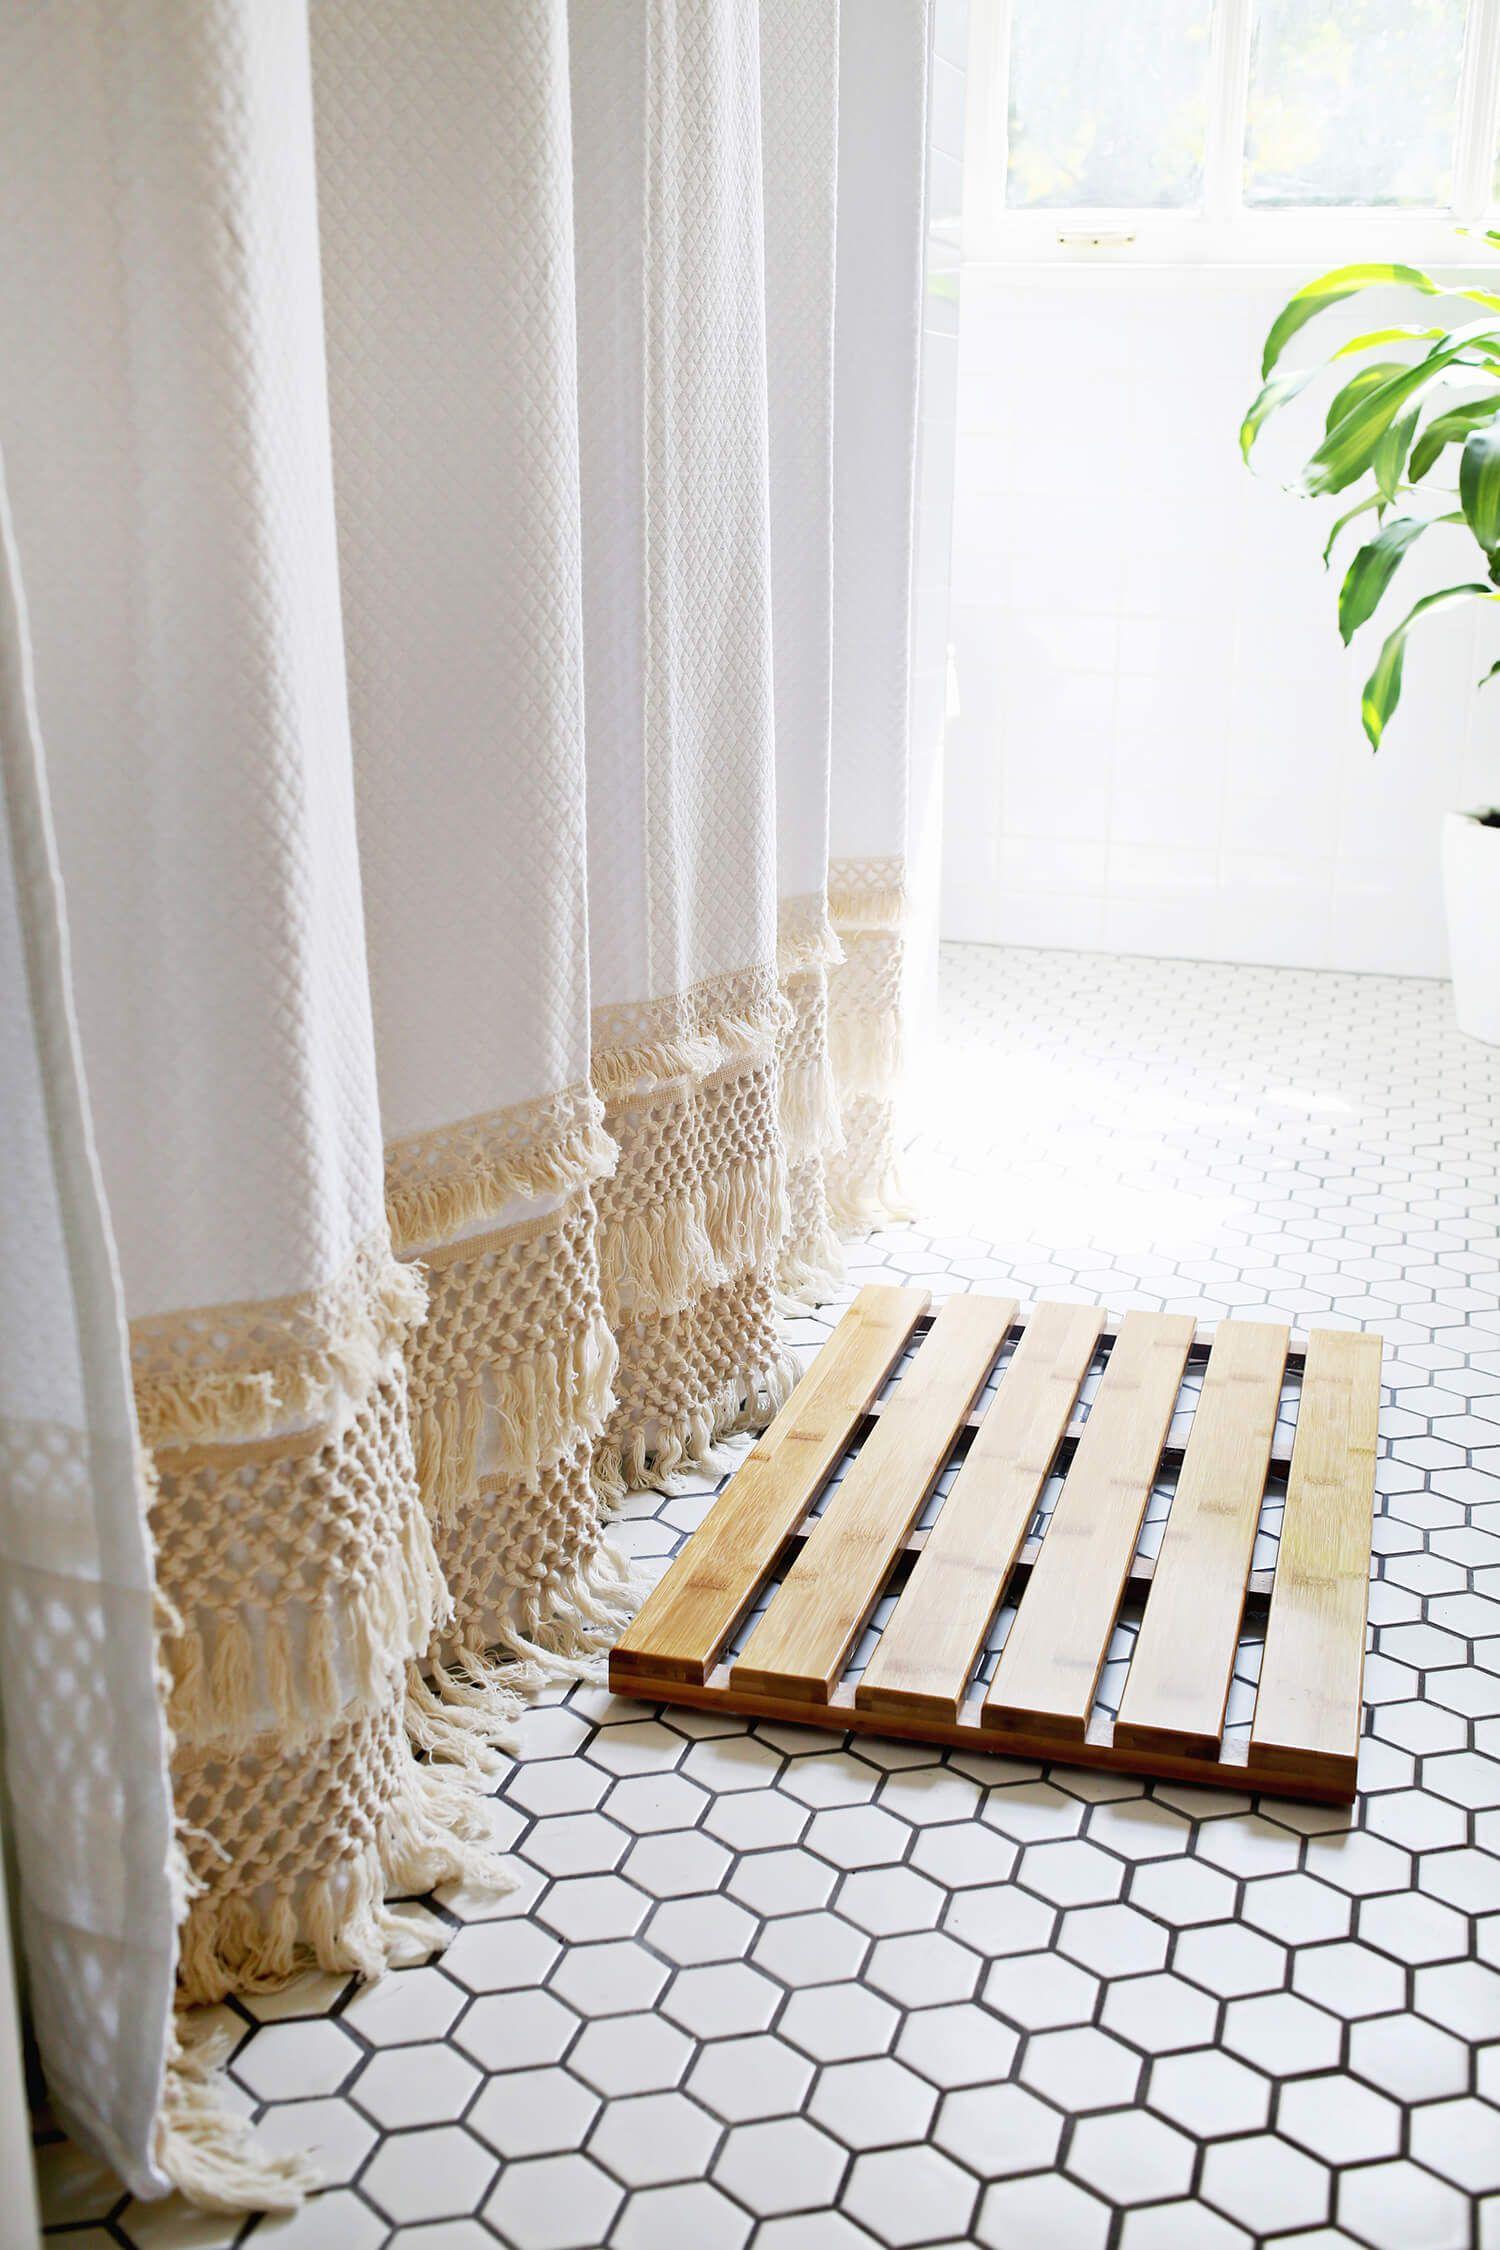 31 DIYs to Transform Your Bathroom